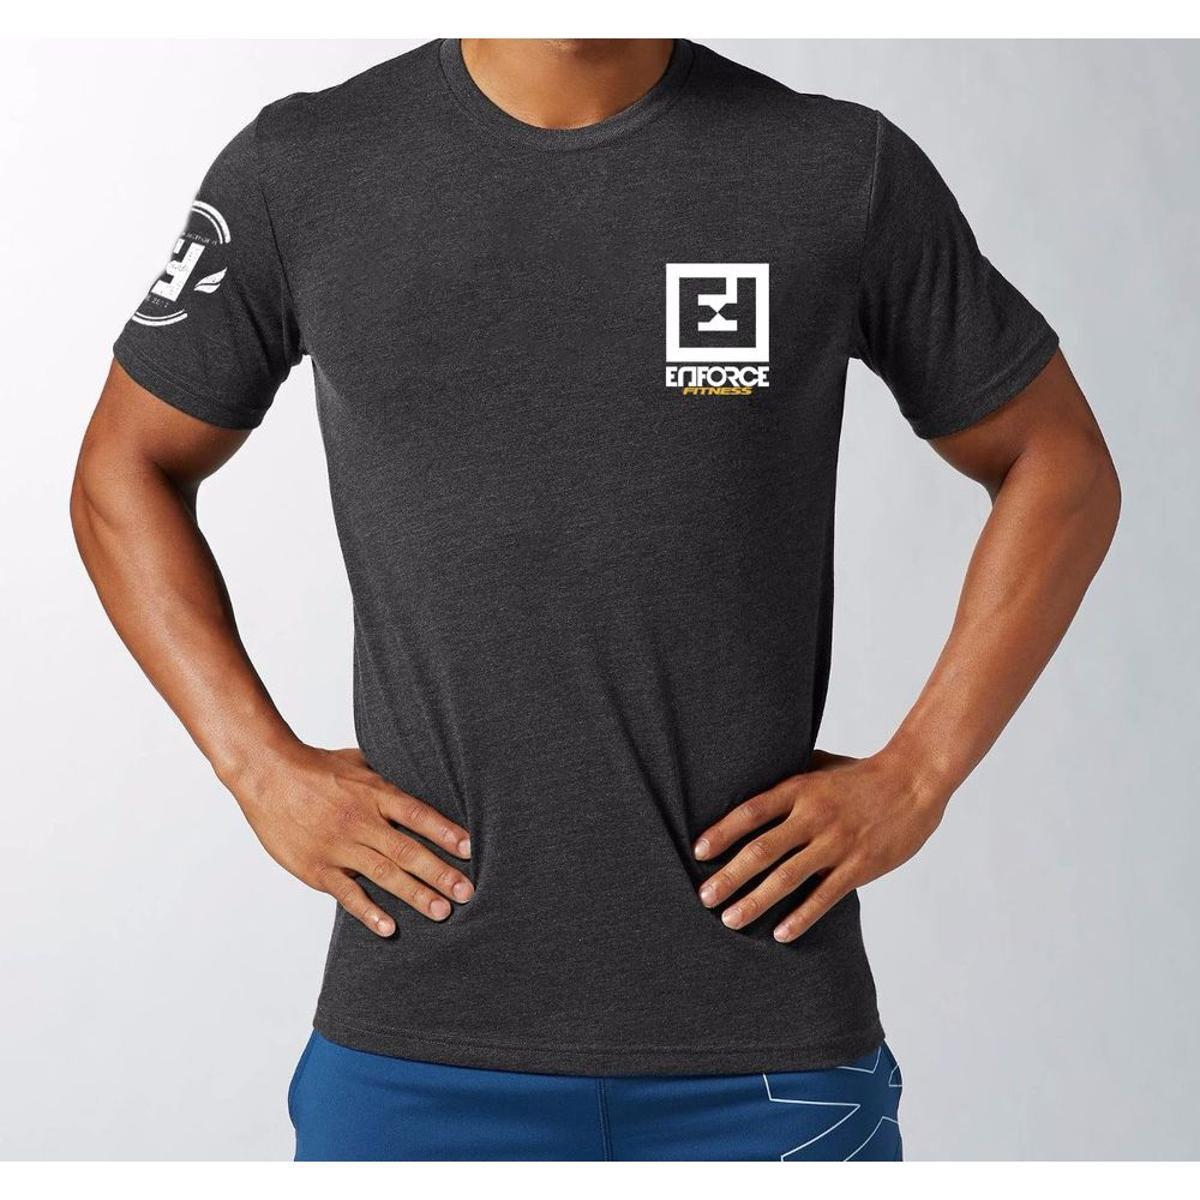 Camiseta Exercícios para Treino Academia Crossfit Funcional - Enforce  Fitness - Cinza - Compre Agora  6991967650bea